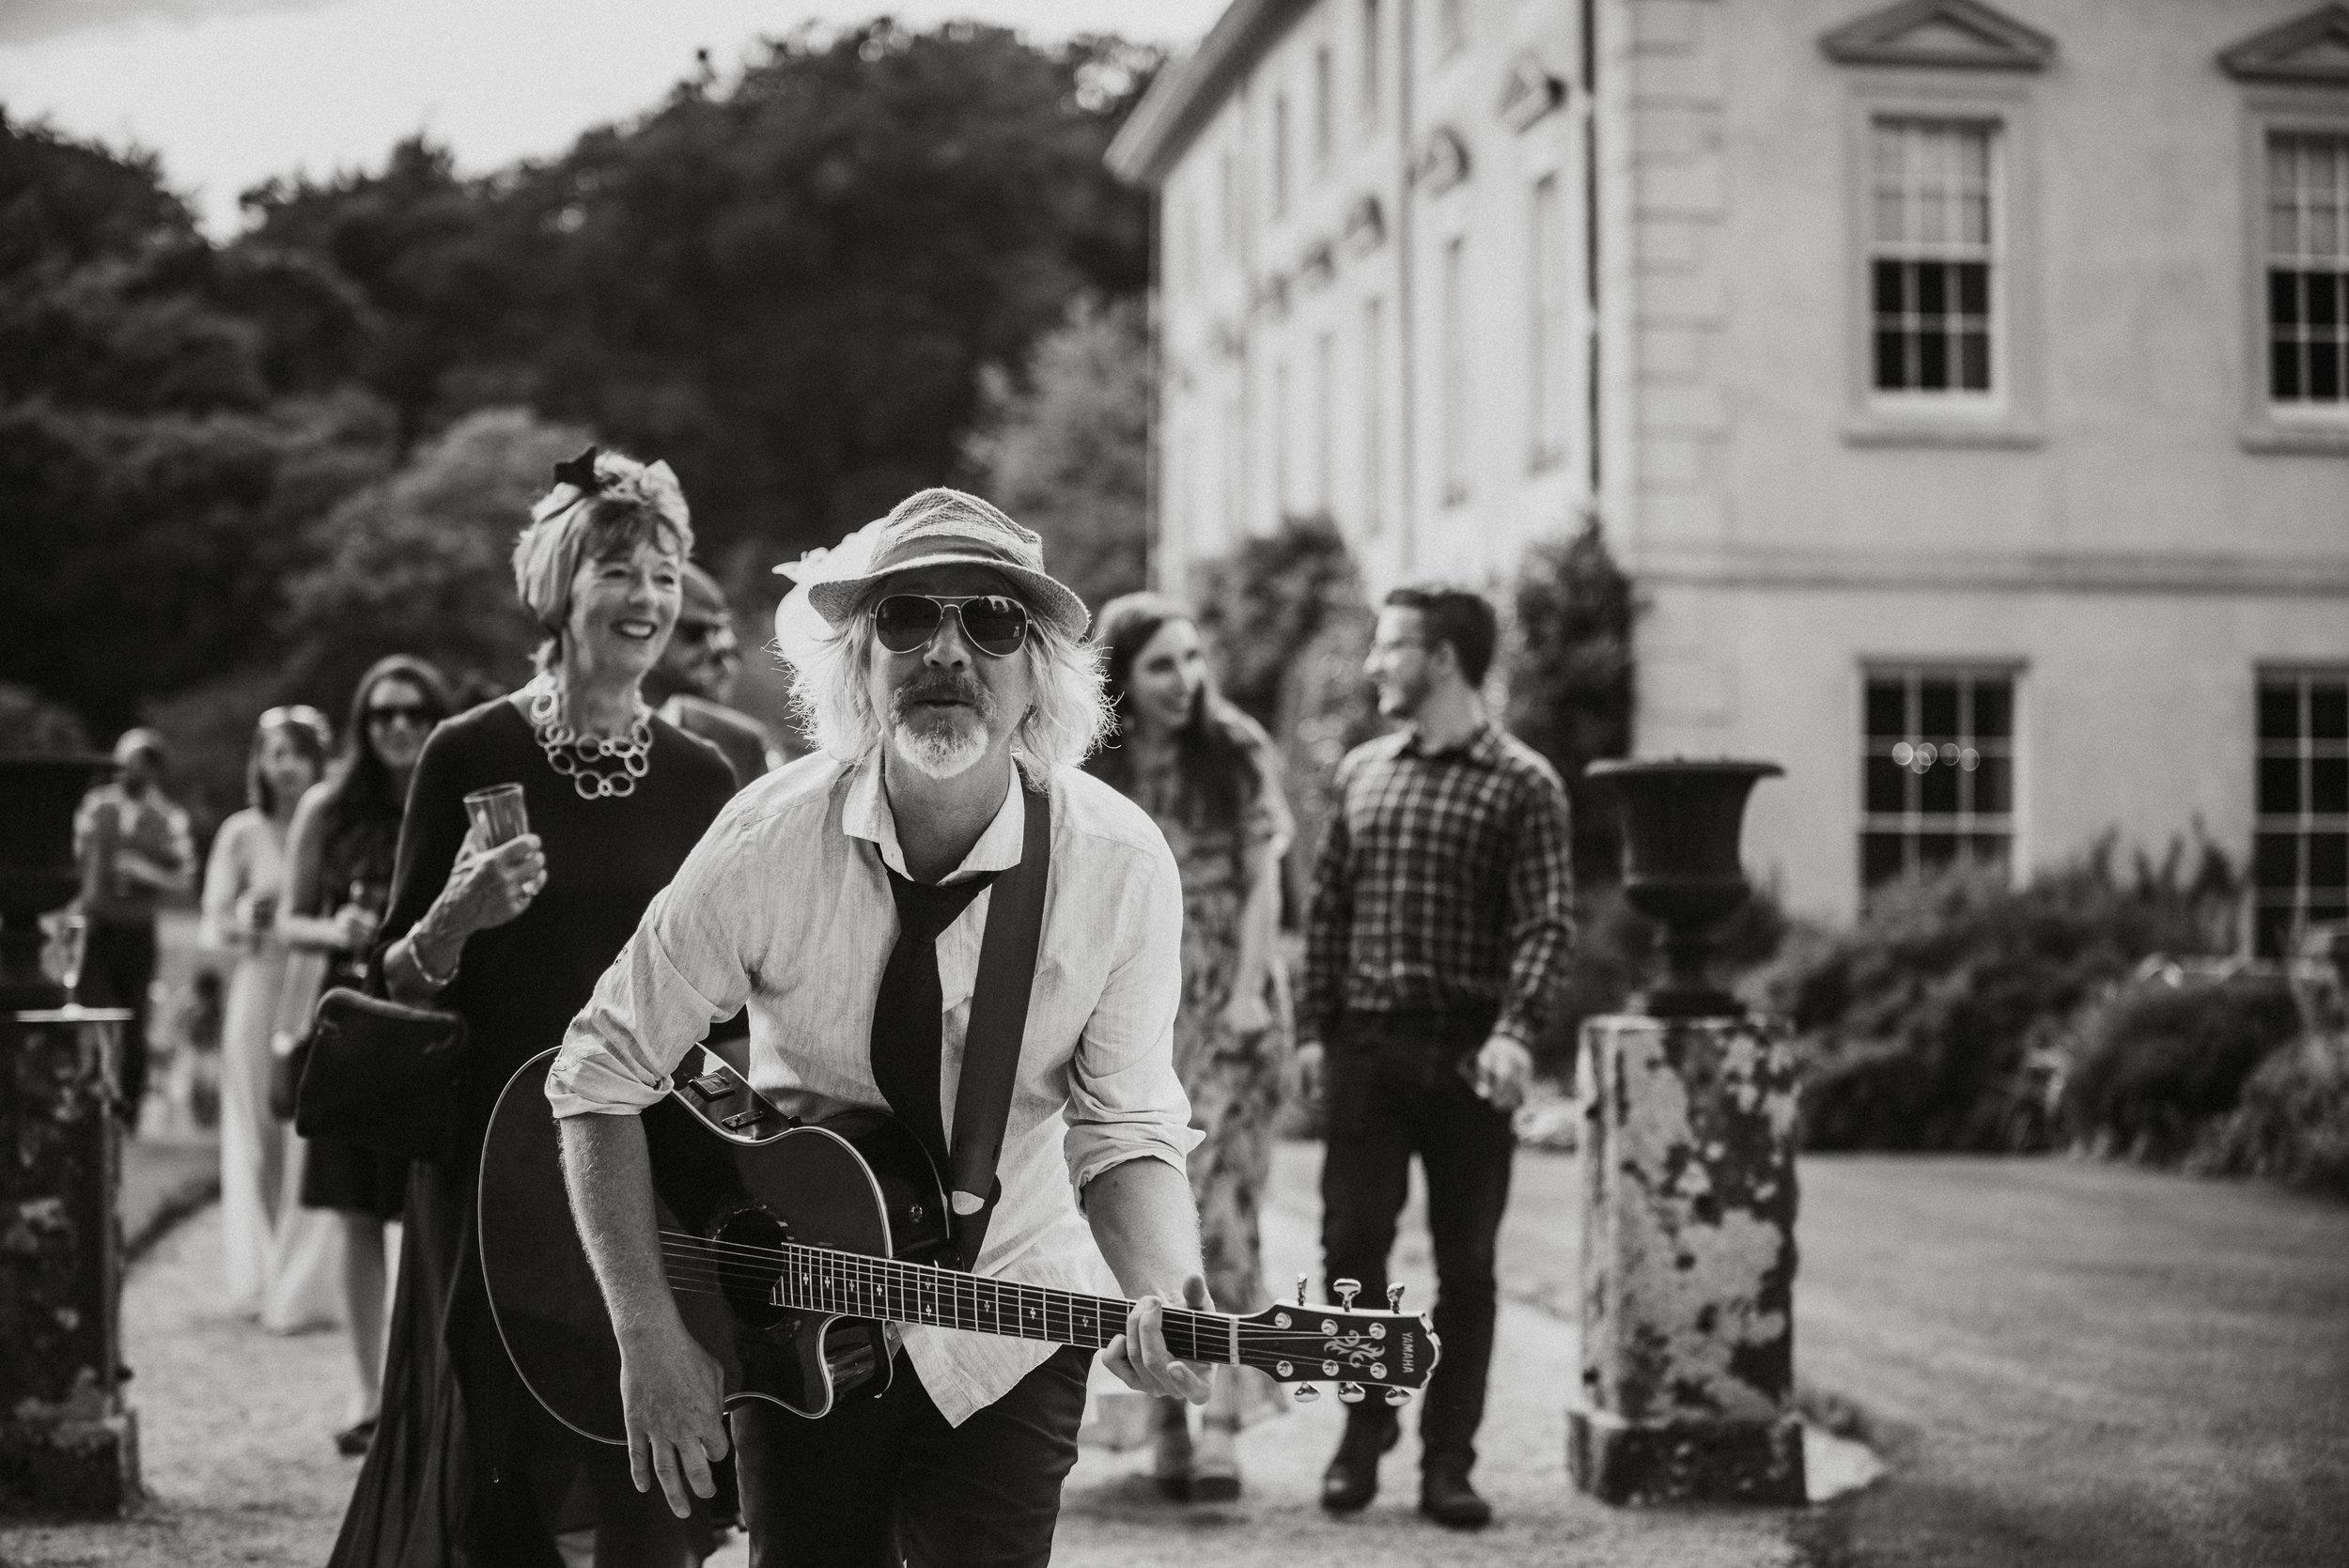 pencarrow-house-wedding-photographer-102.jpg